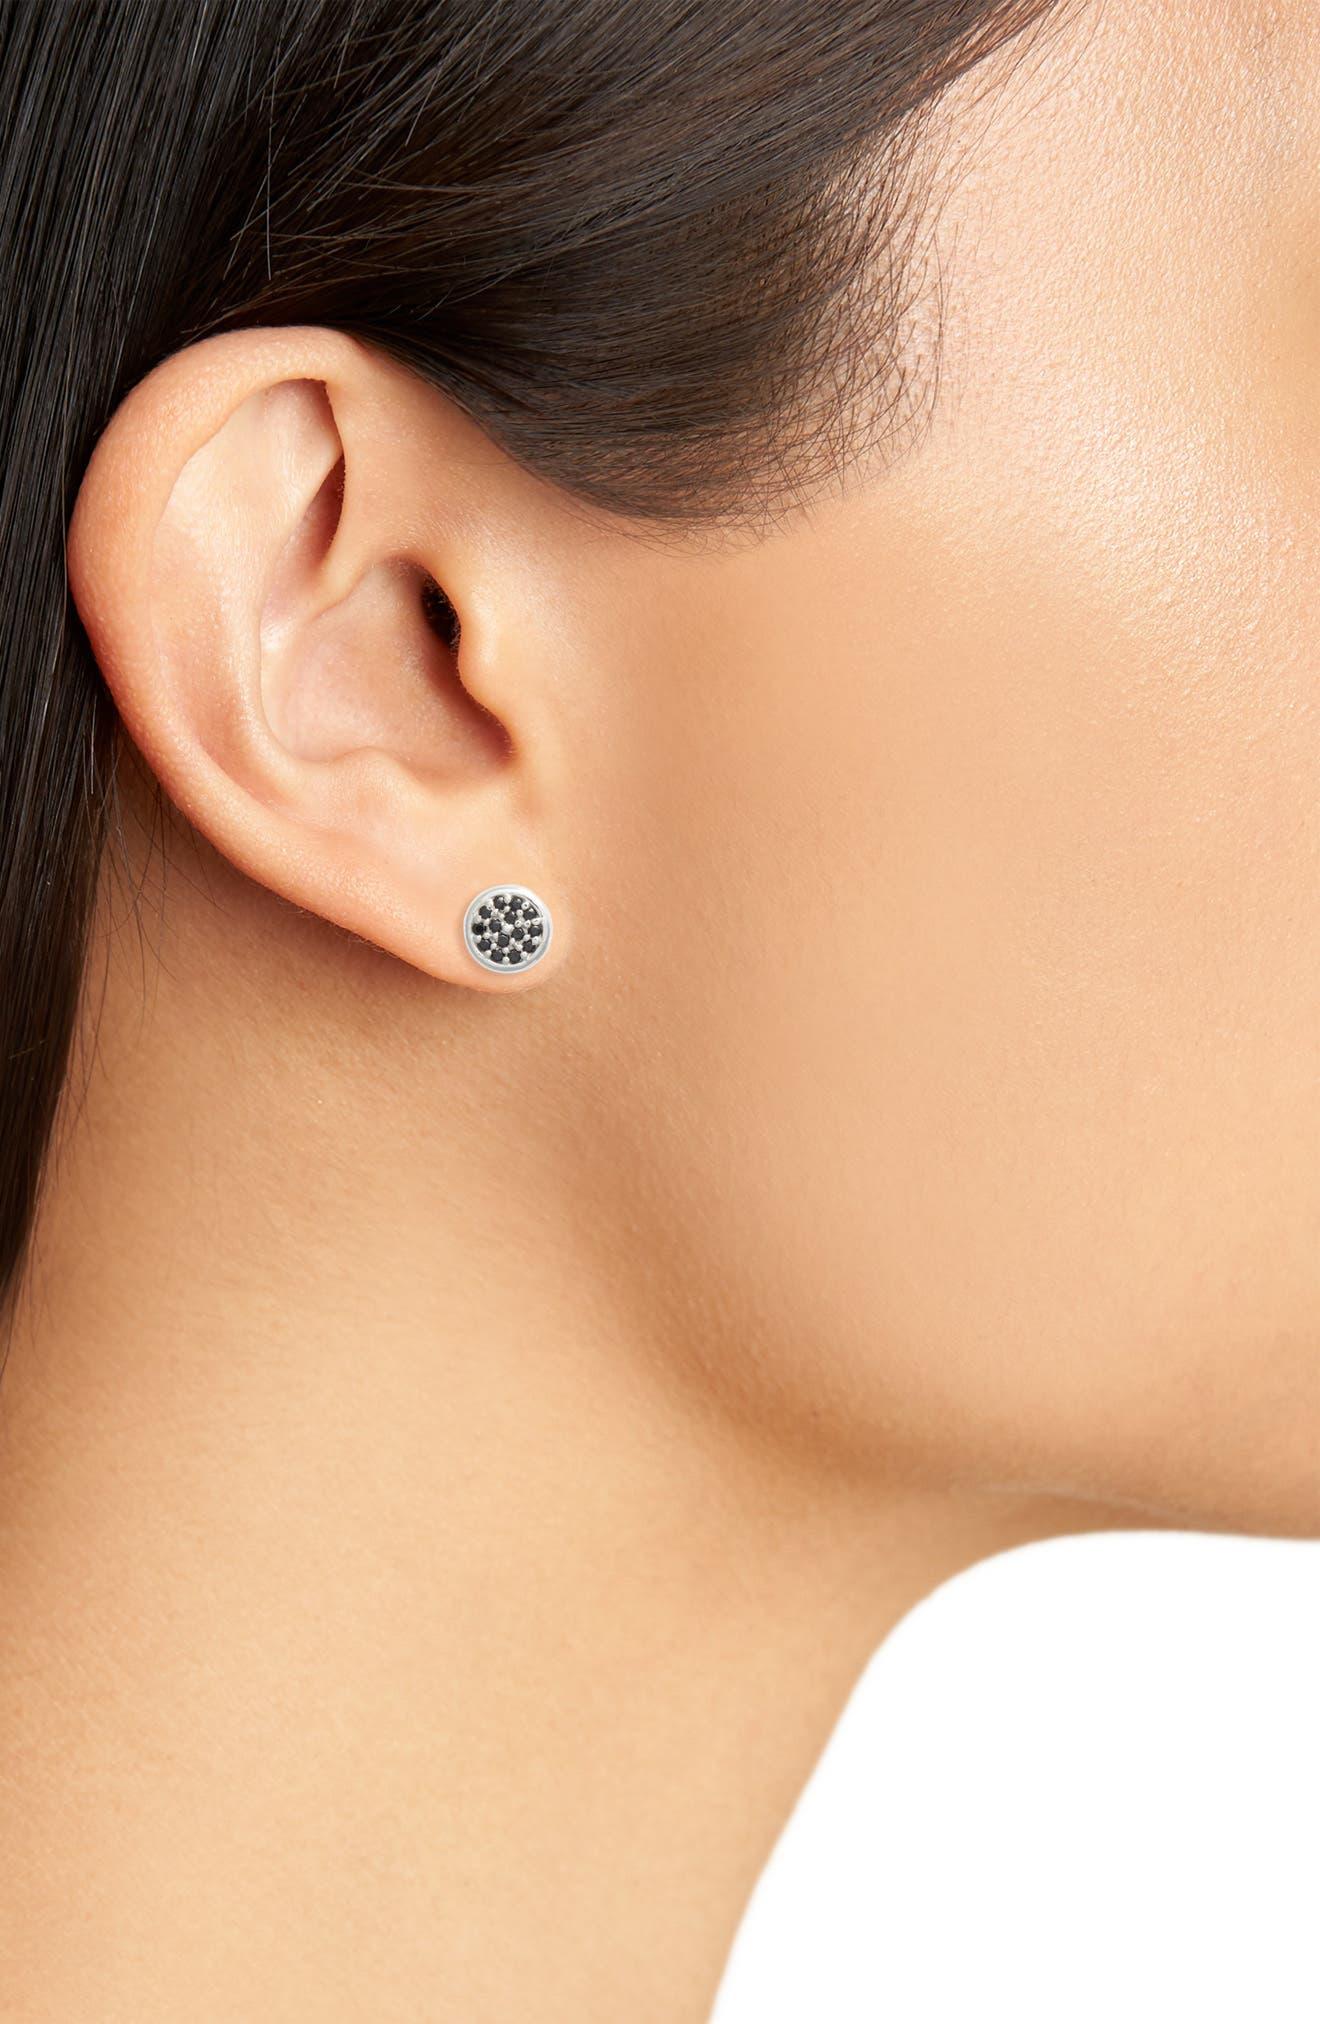 Cubic Zirconia Stud Earrings,                             Alternate thumbnail 2, color,                             BLACK/ SILVER